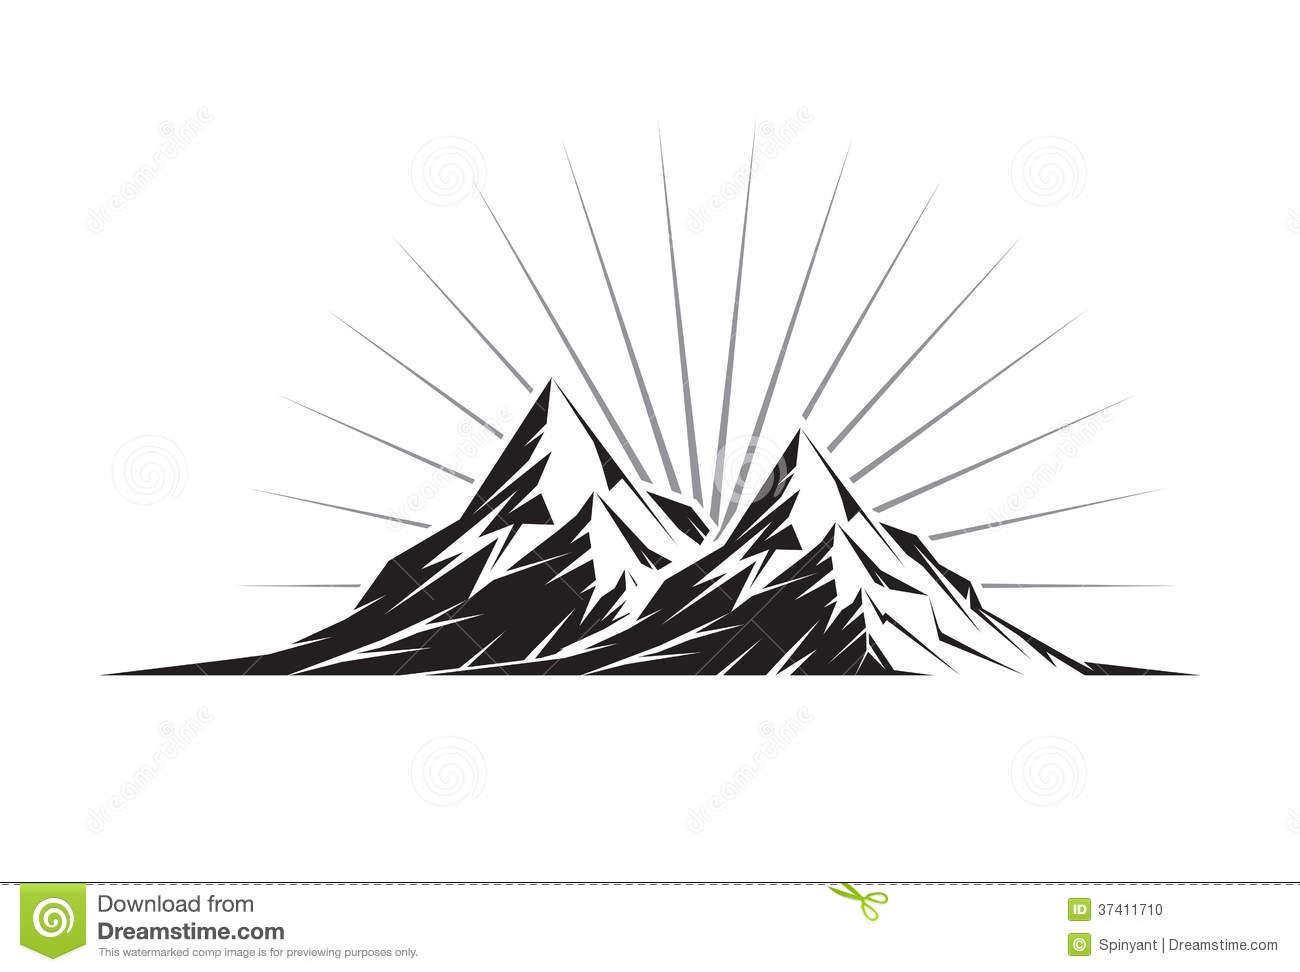 San Francisco Peaks clipart #8, Download drawings